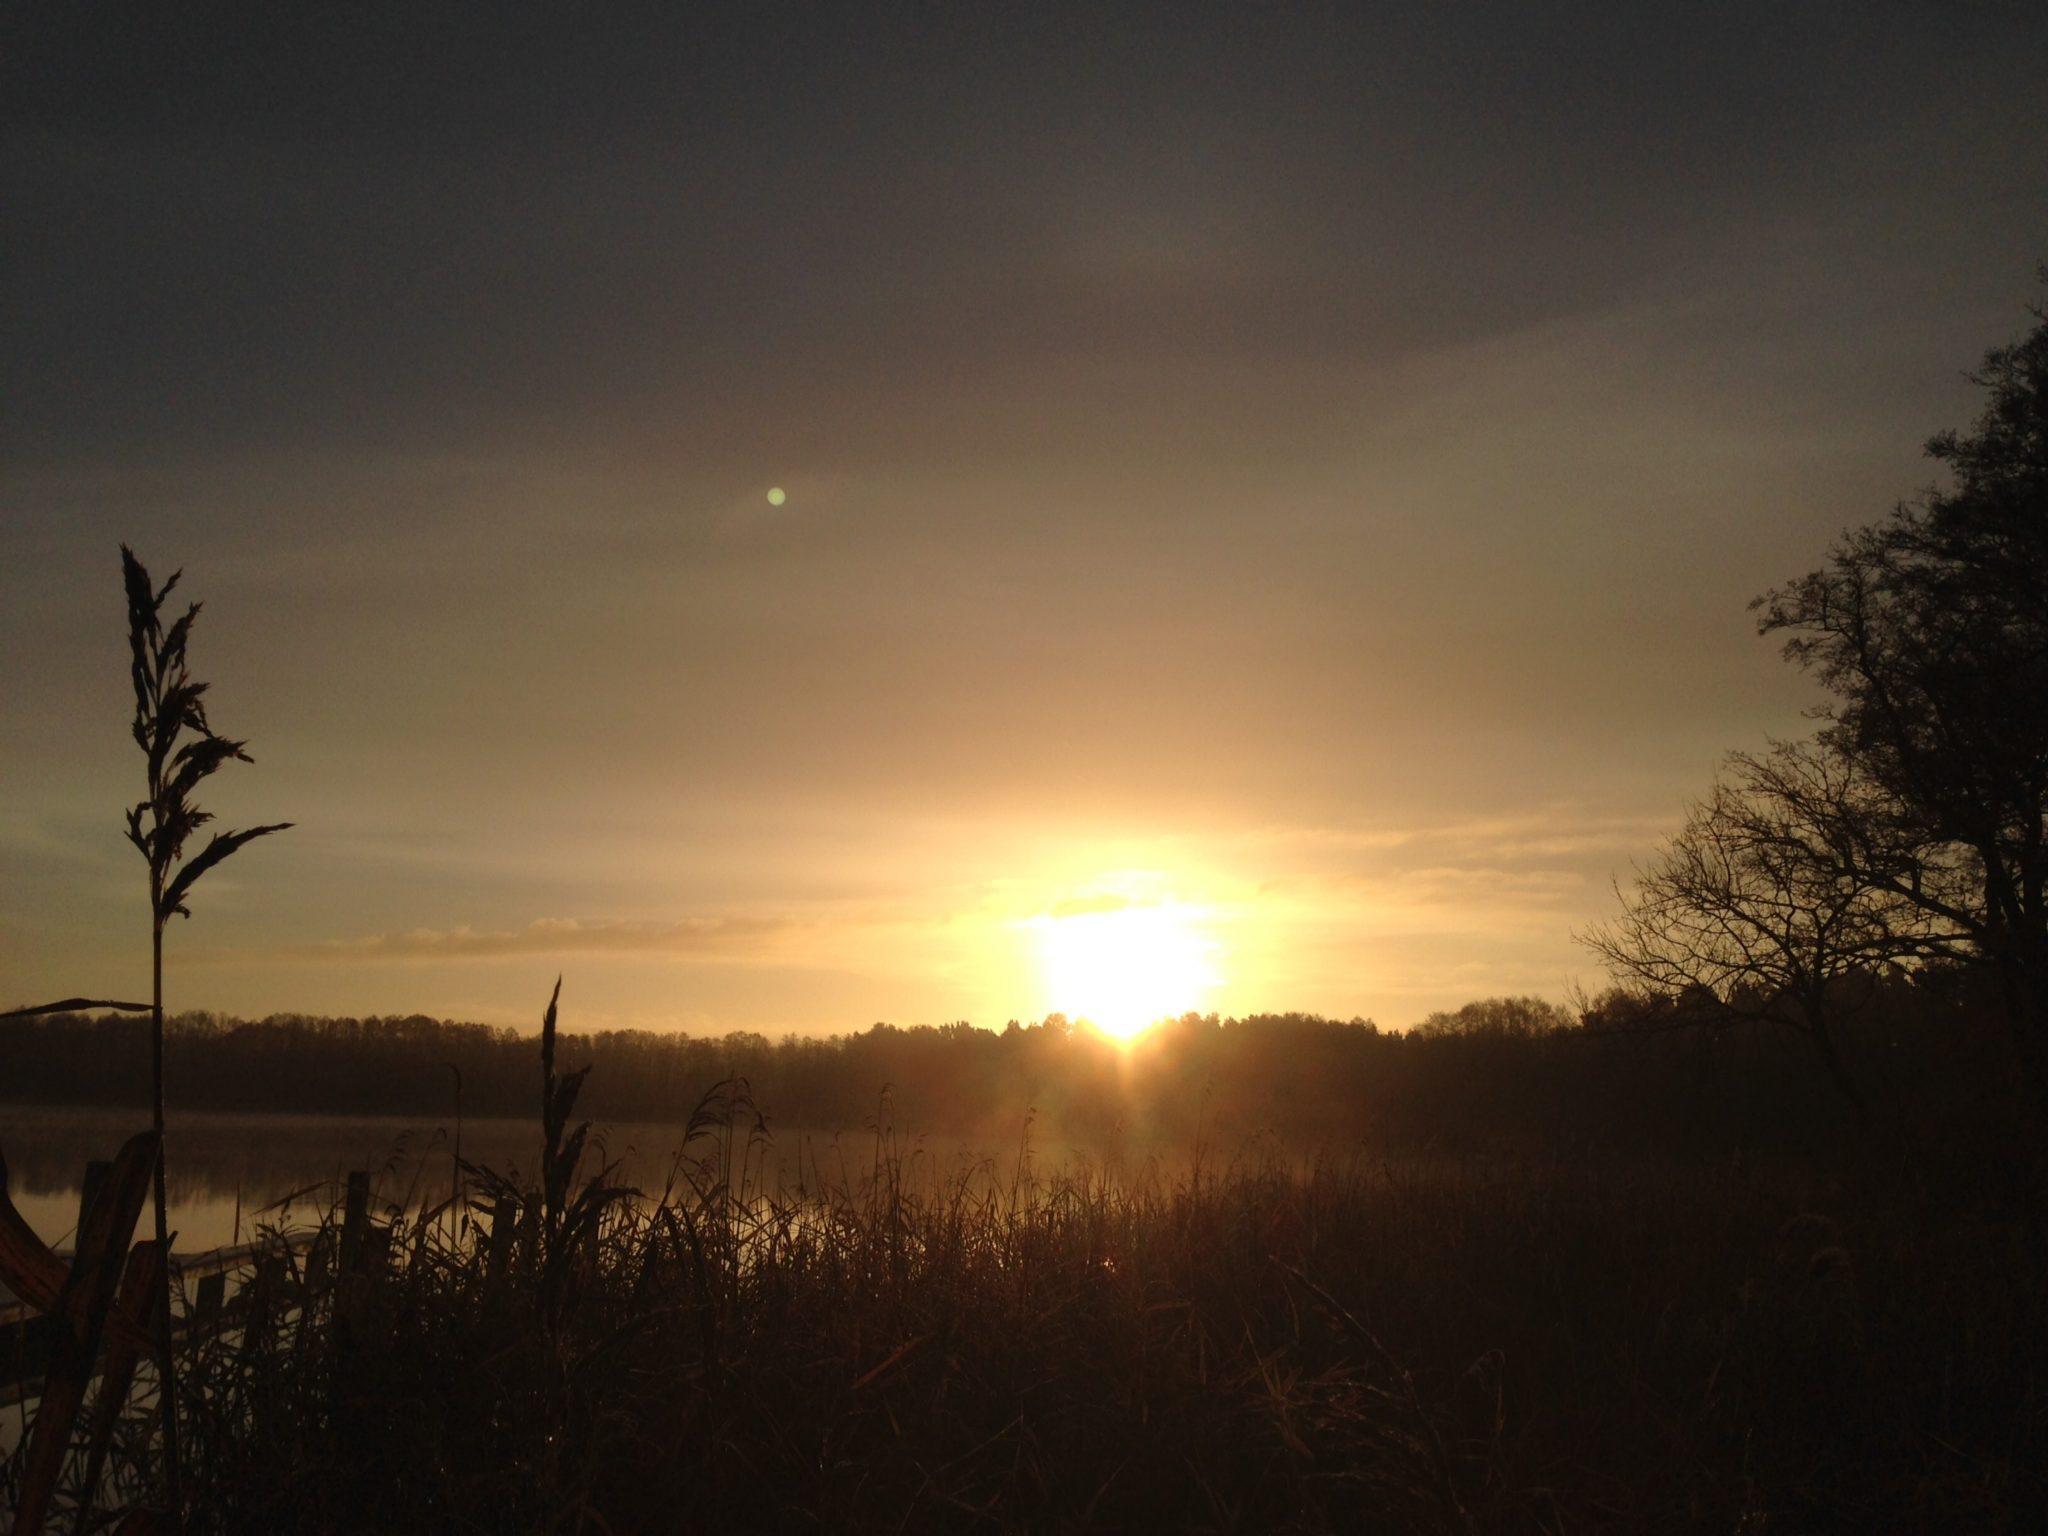 Sonnenaufgang am Pälitzsee im November